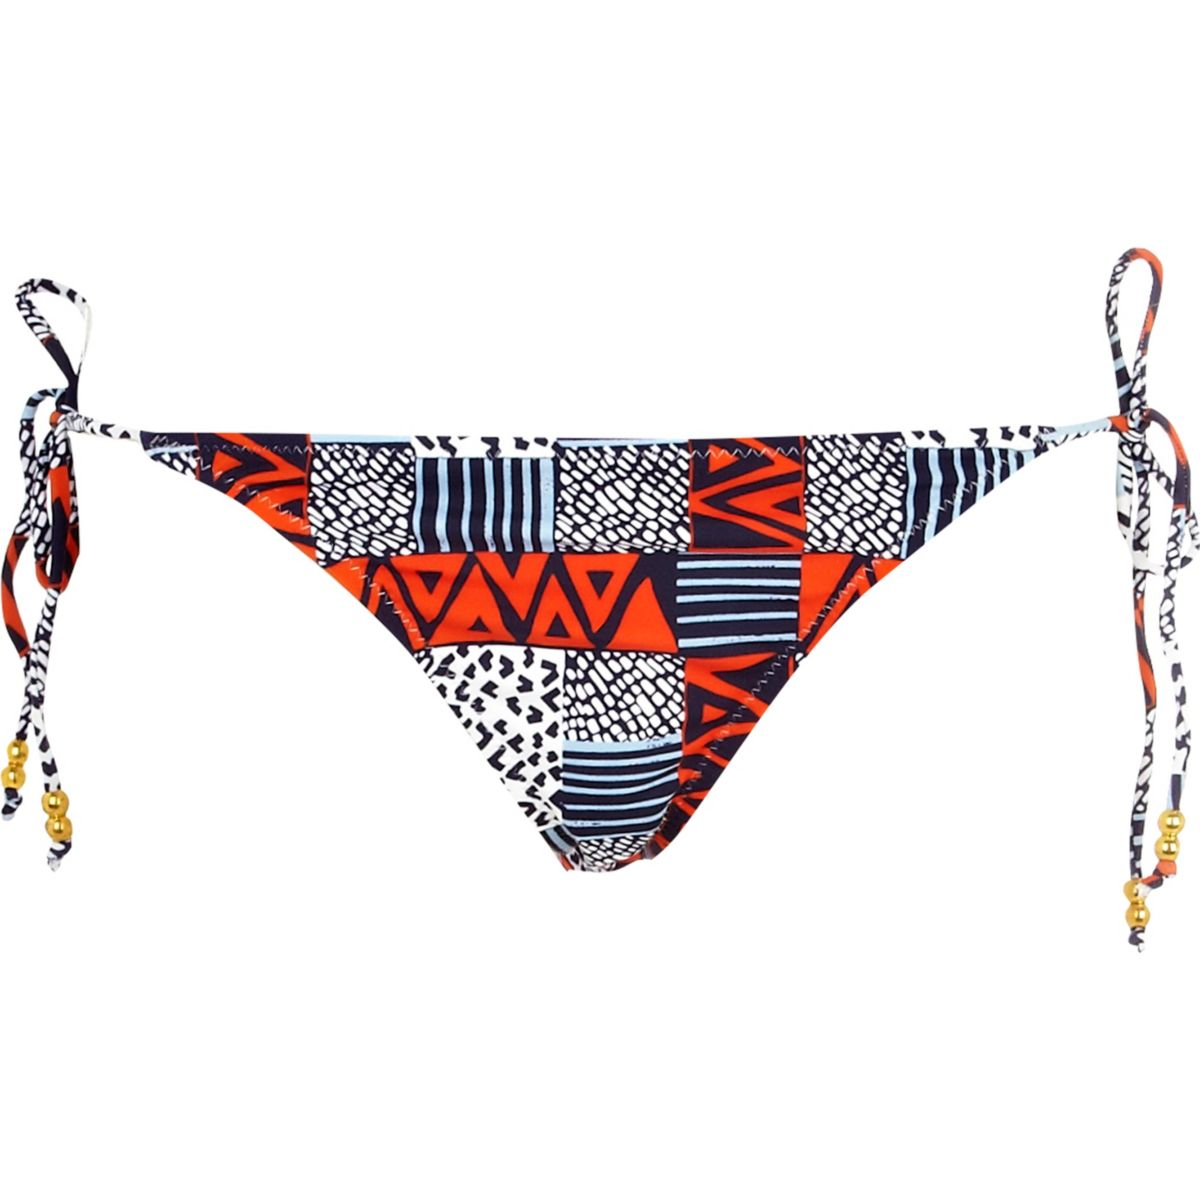 Bikinibroekje met blauw-rode print